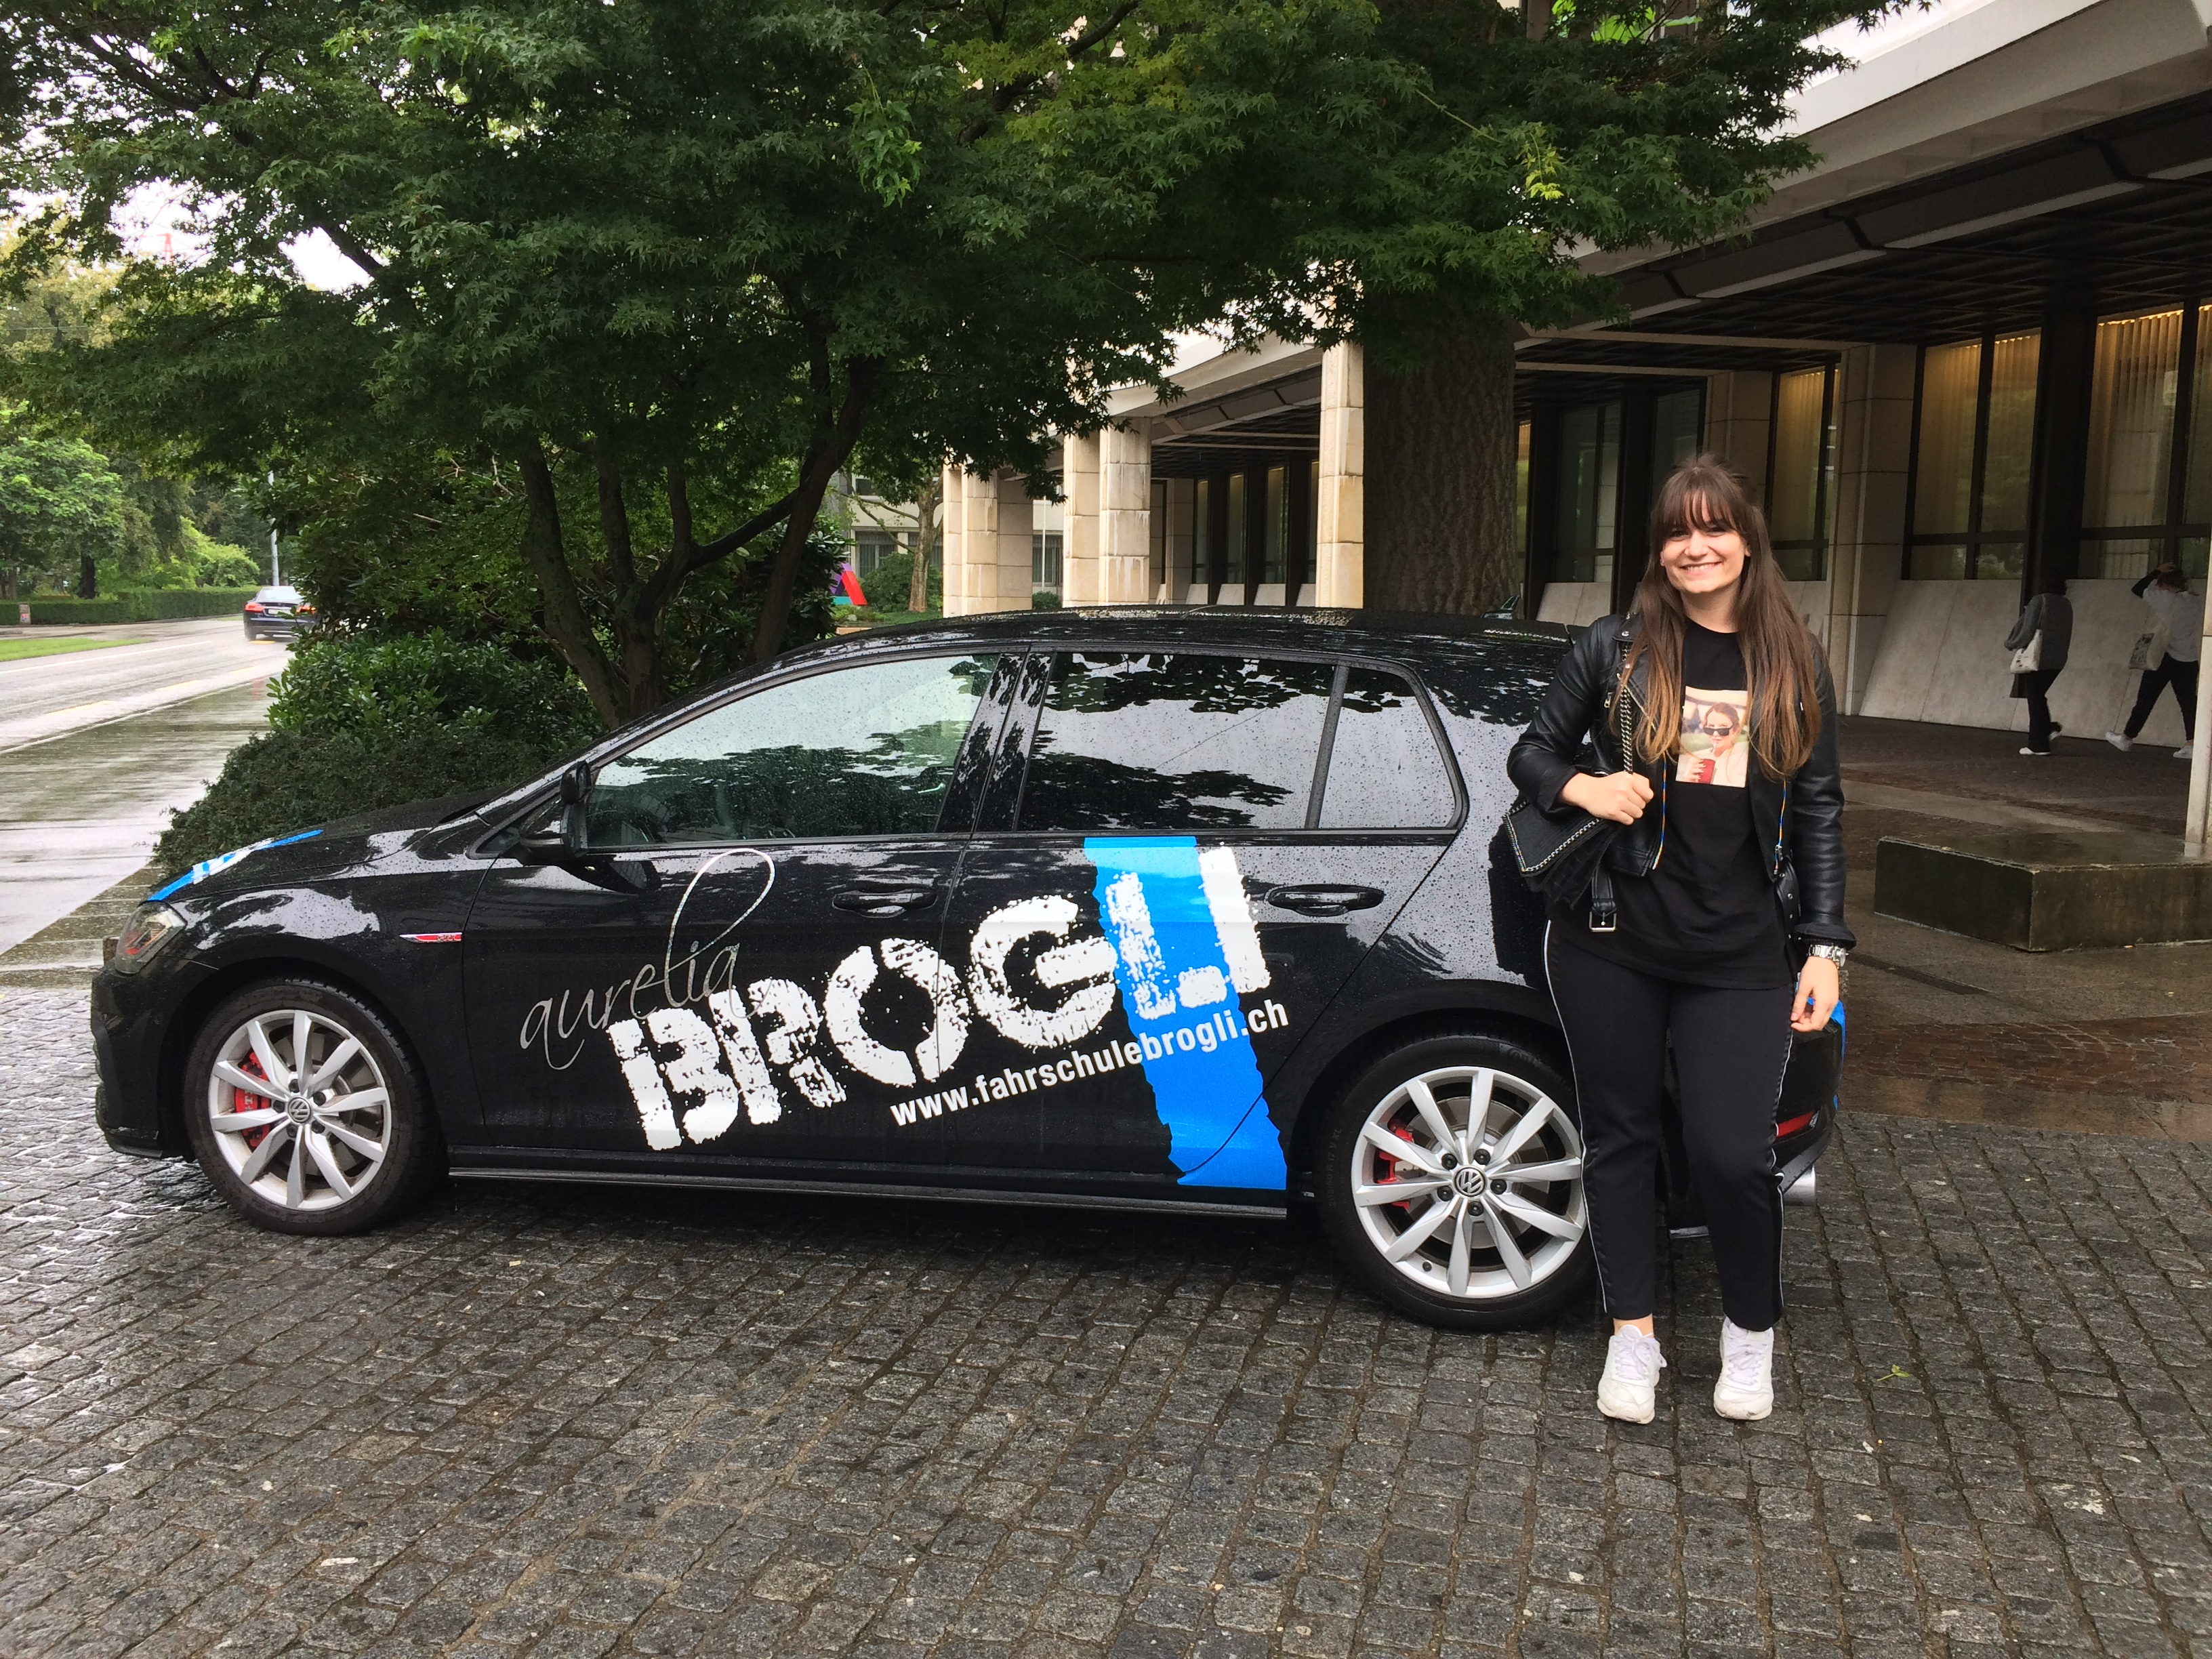 Fahrschule Brogli, Rheinfelden Kristina